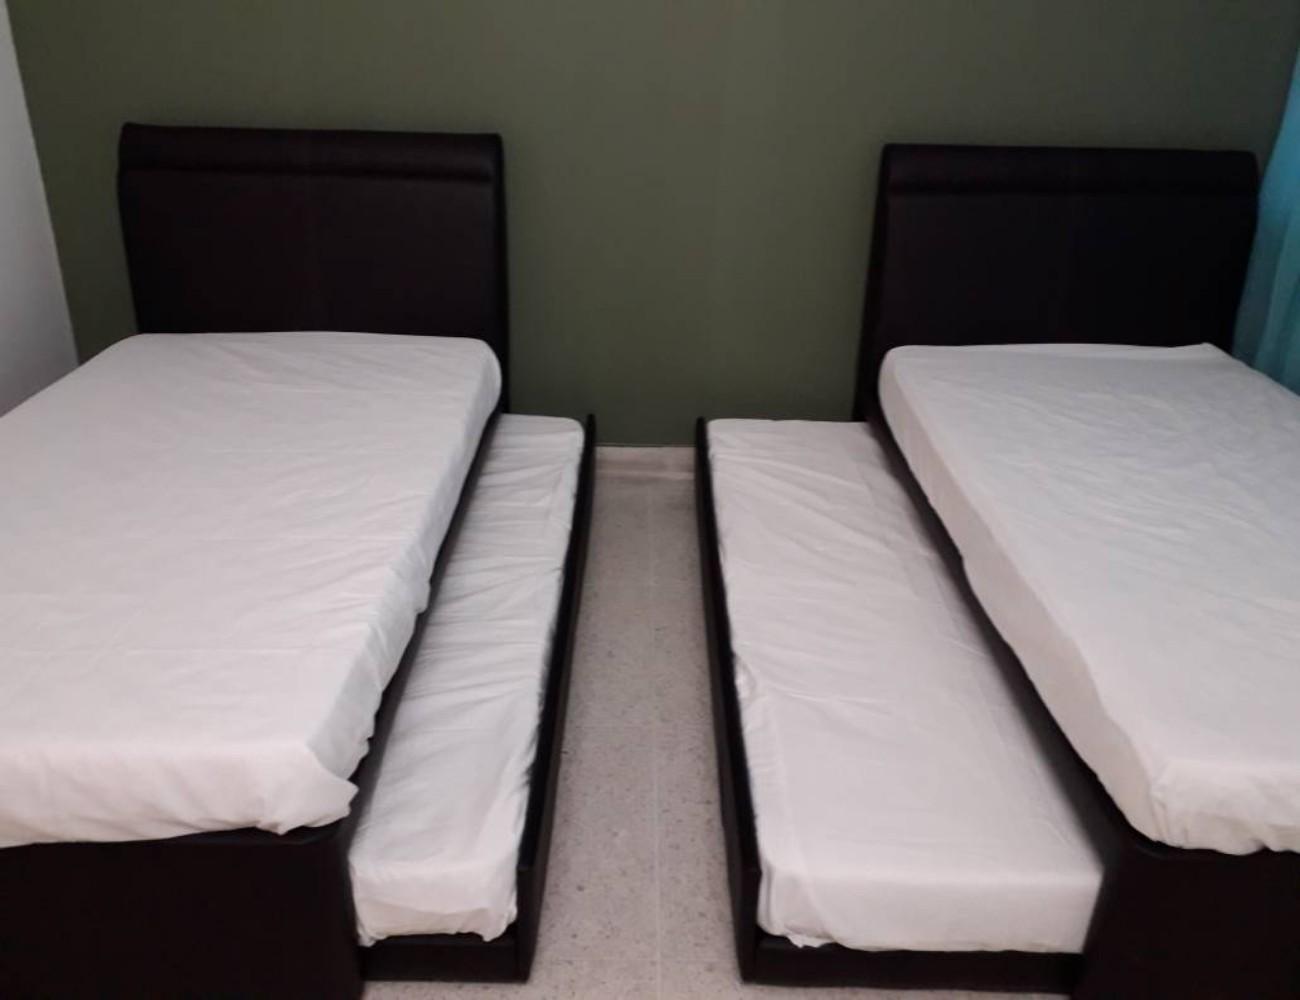 Cheras Yulek Room For Rent Kuala Lumpur Malaysia